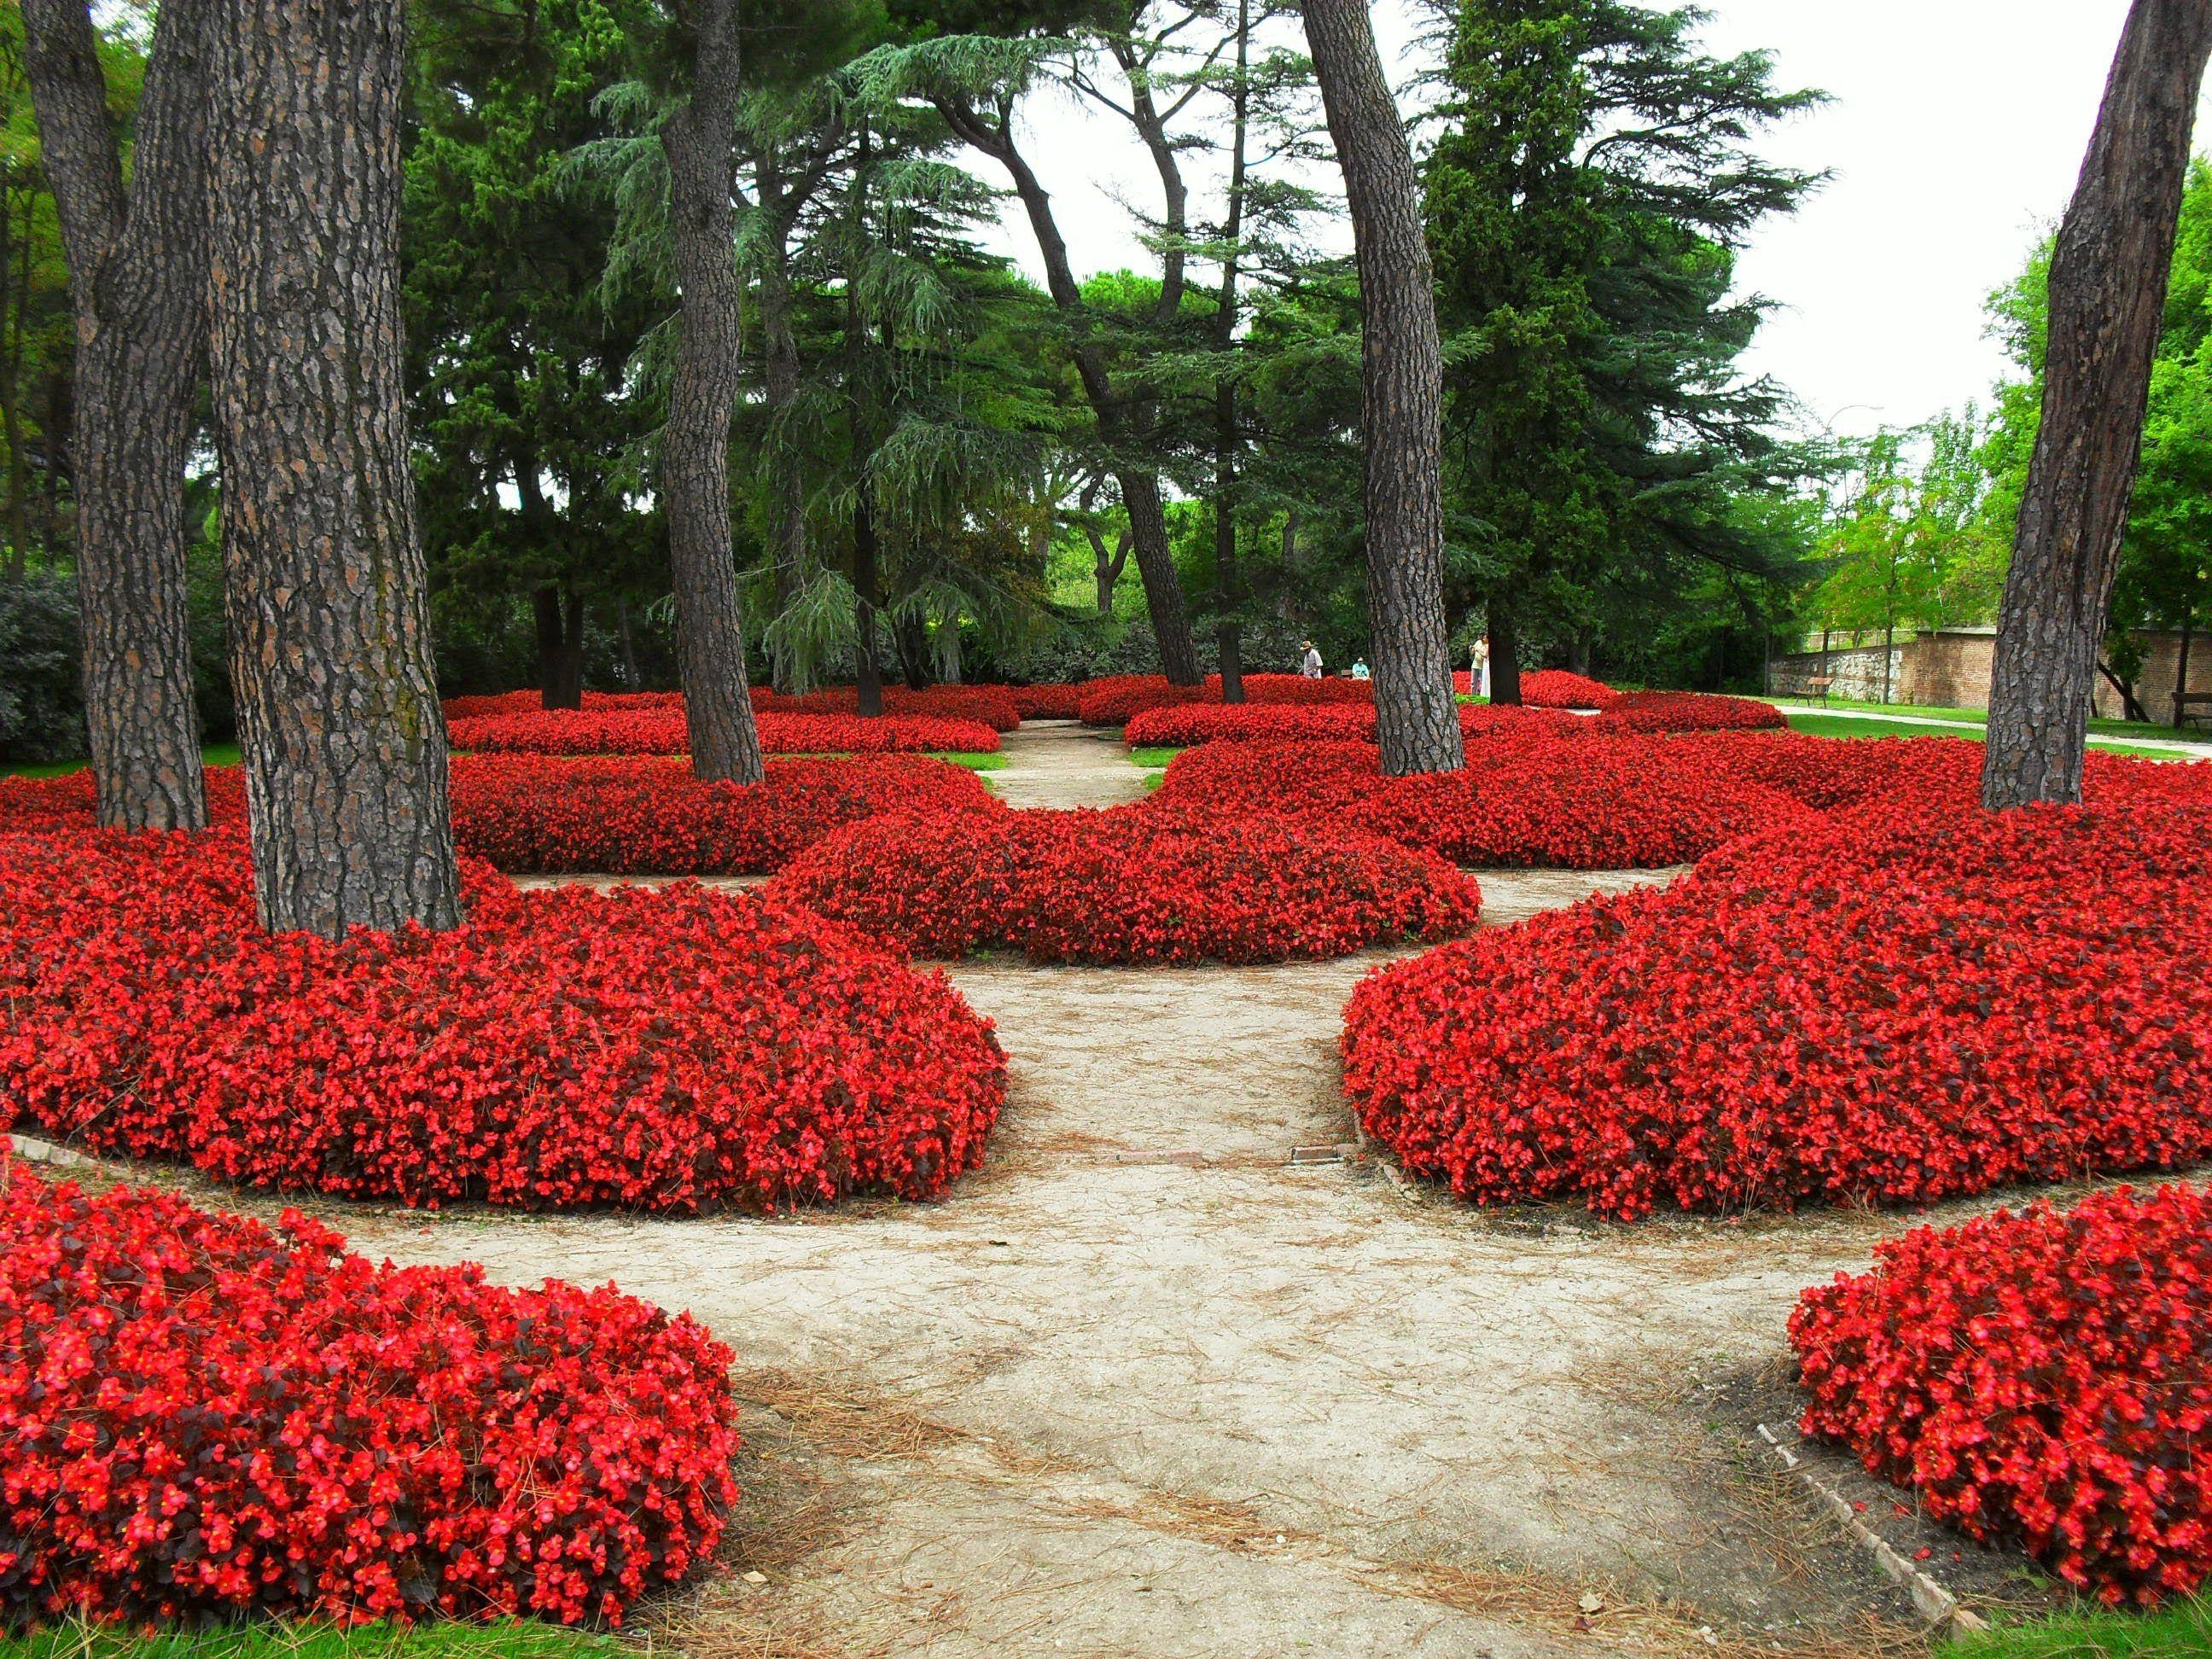 Parque del capricho madrid hd 3d arte y jardiner a dise o de jardines parques pinterest - Disenos de jardineria ...